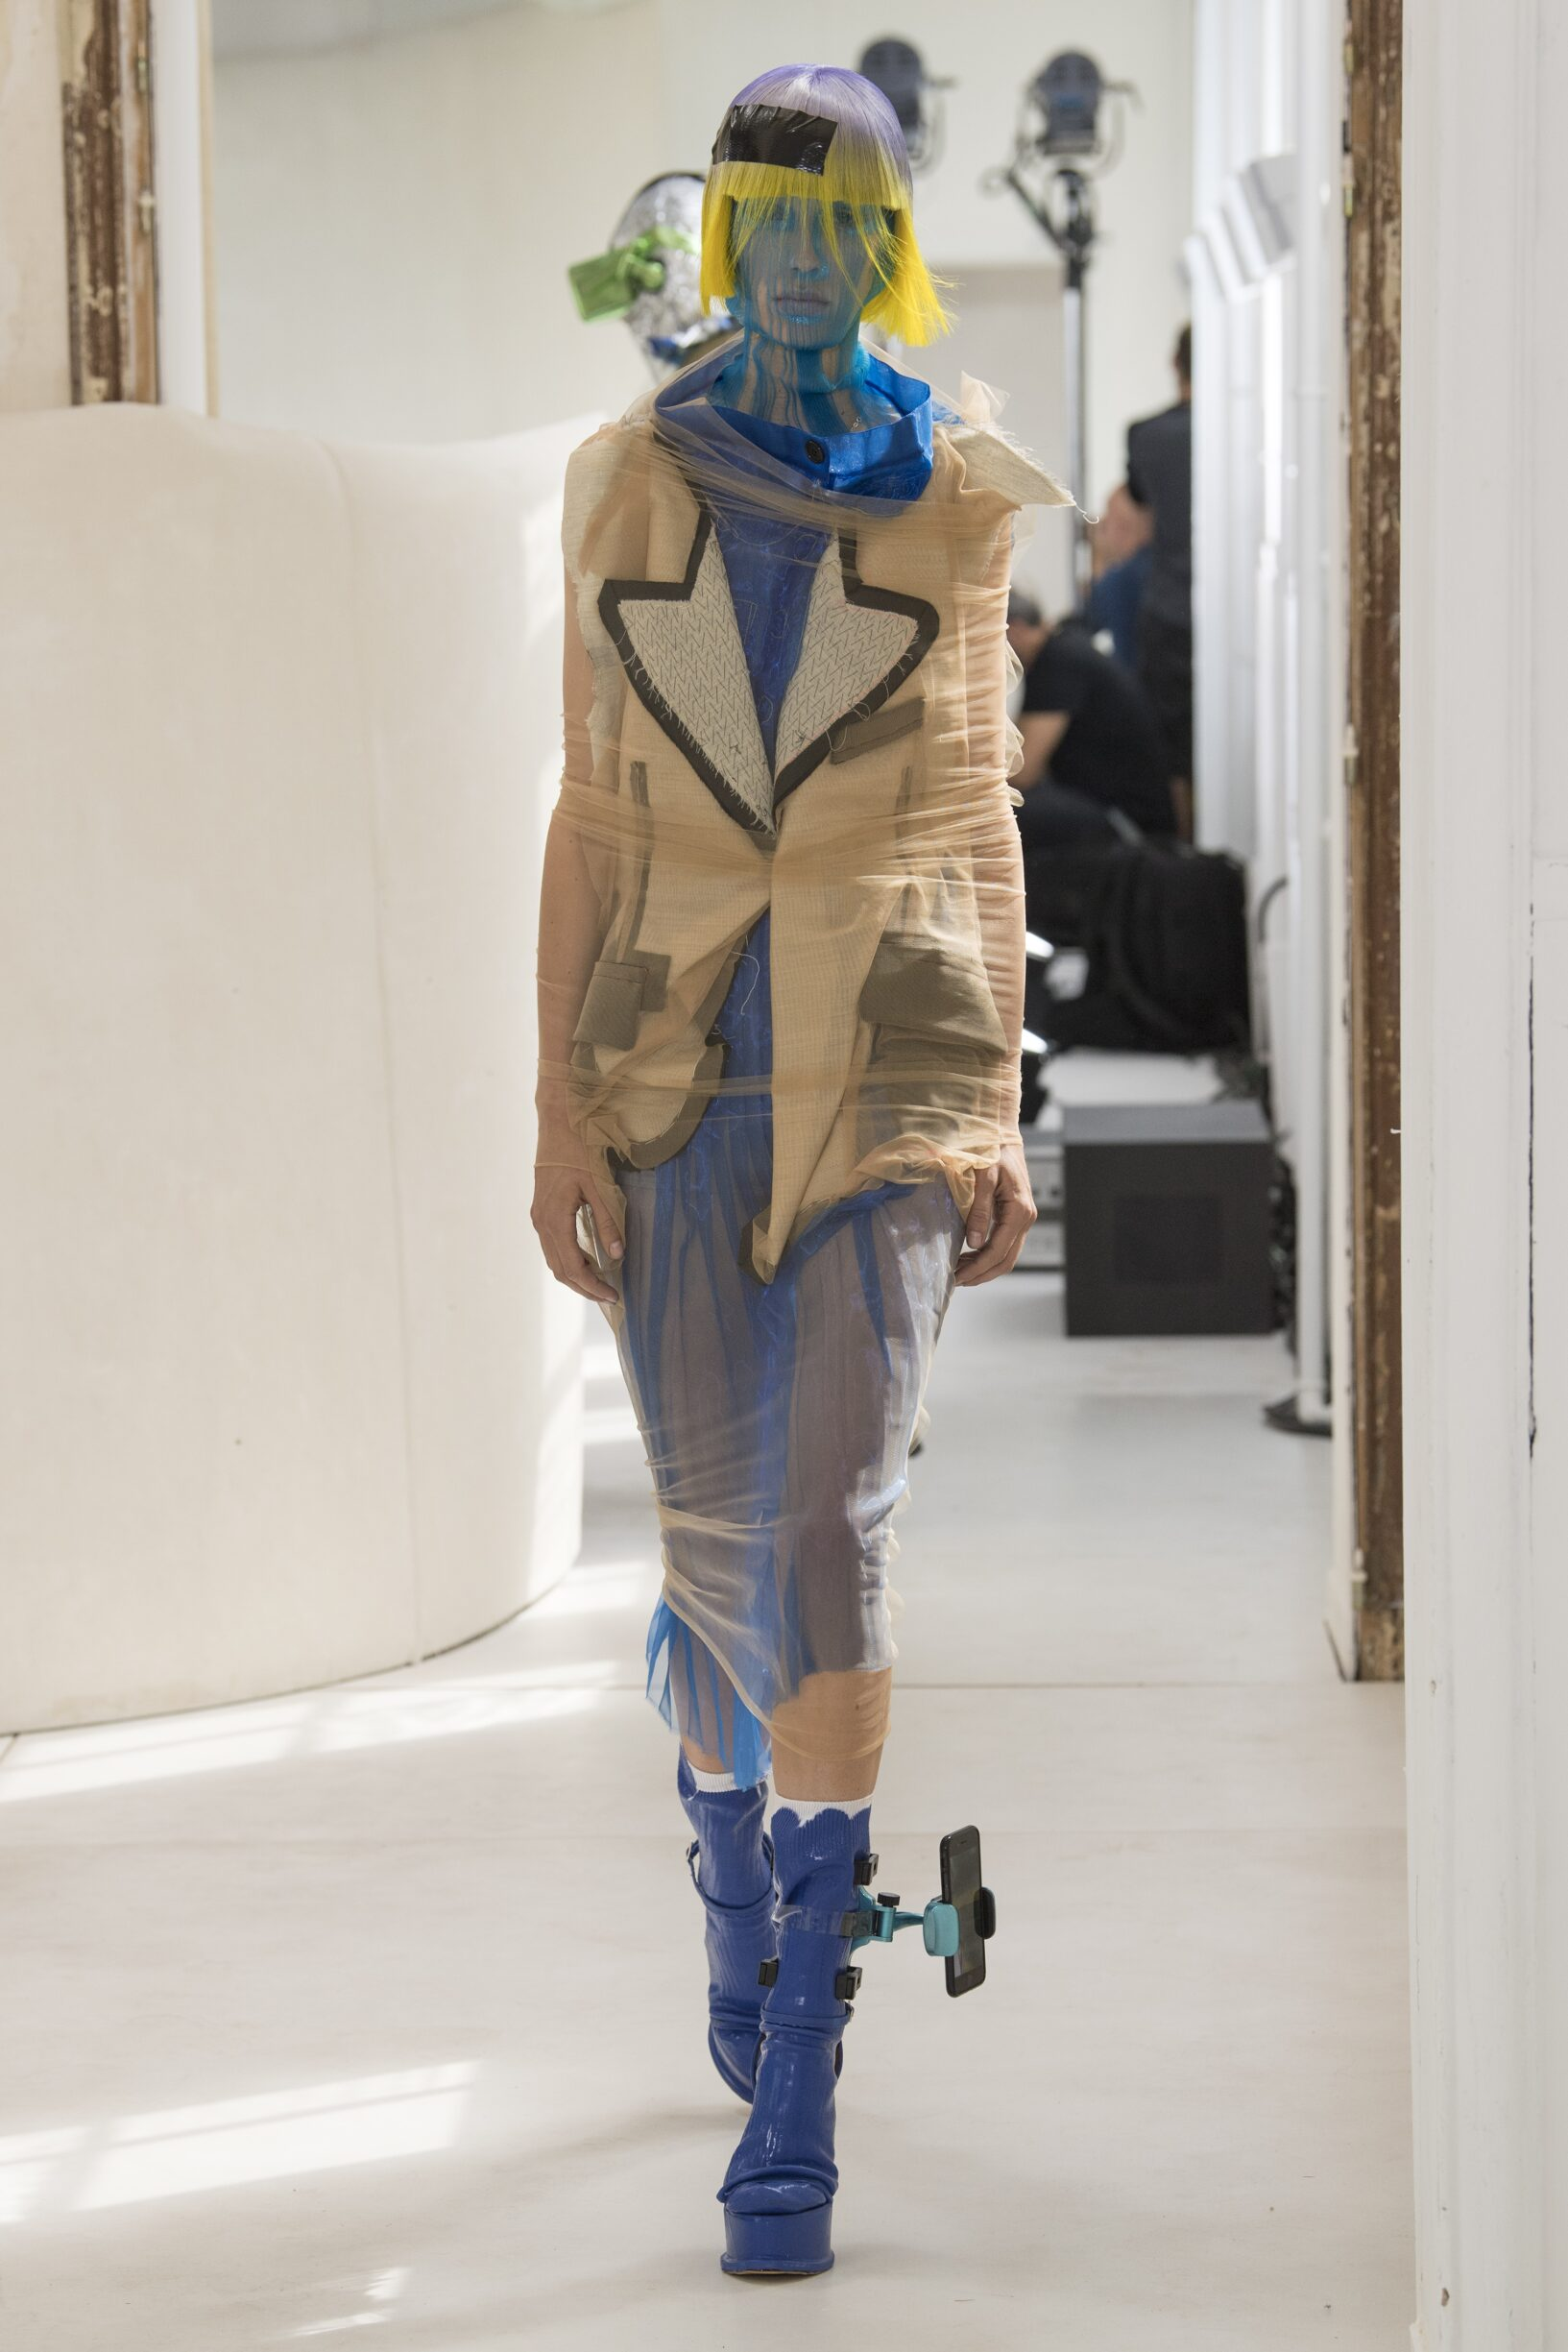 Maison Margiela Artisanal Women's Collection 2018 19